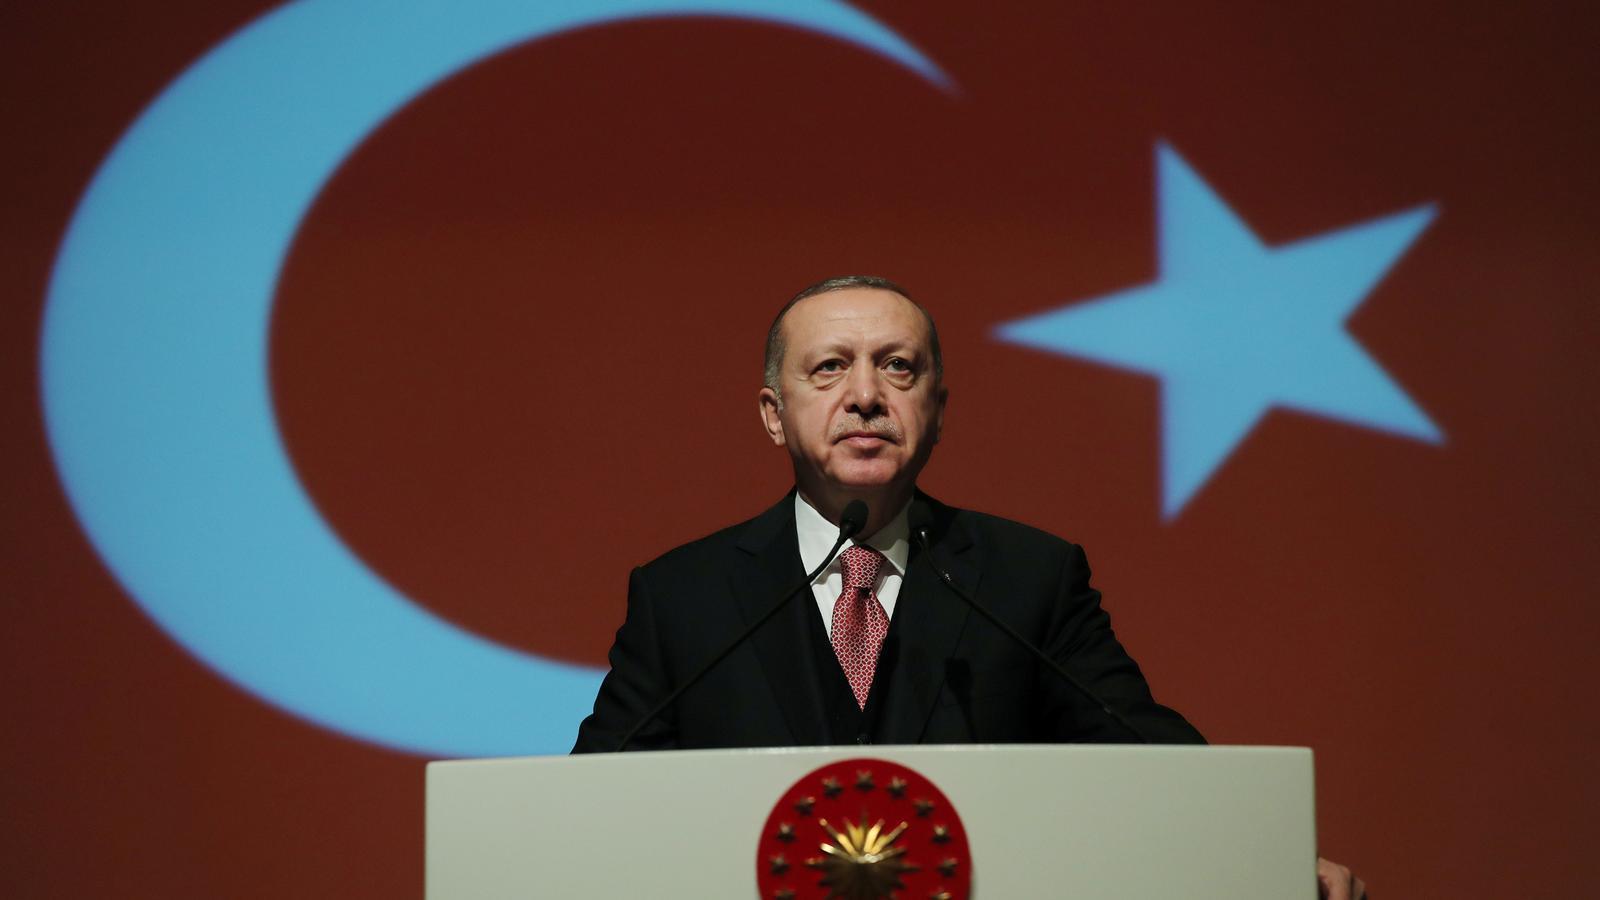 La policia turca deté 182 soldats per colpisme